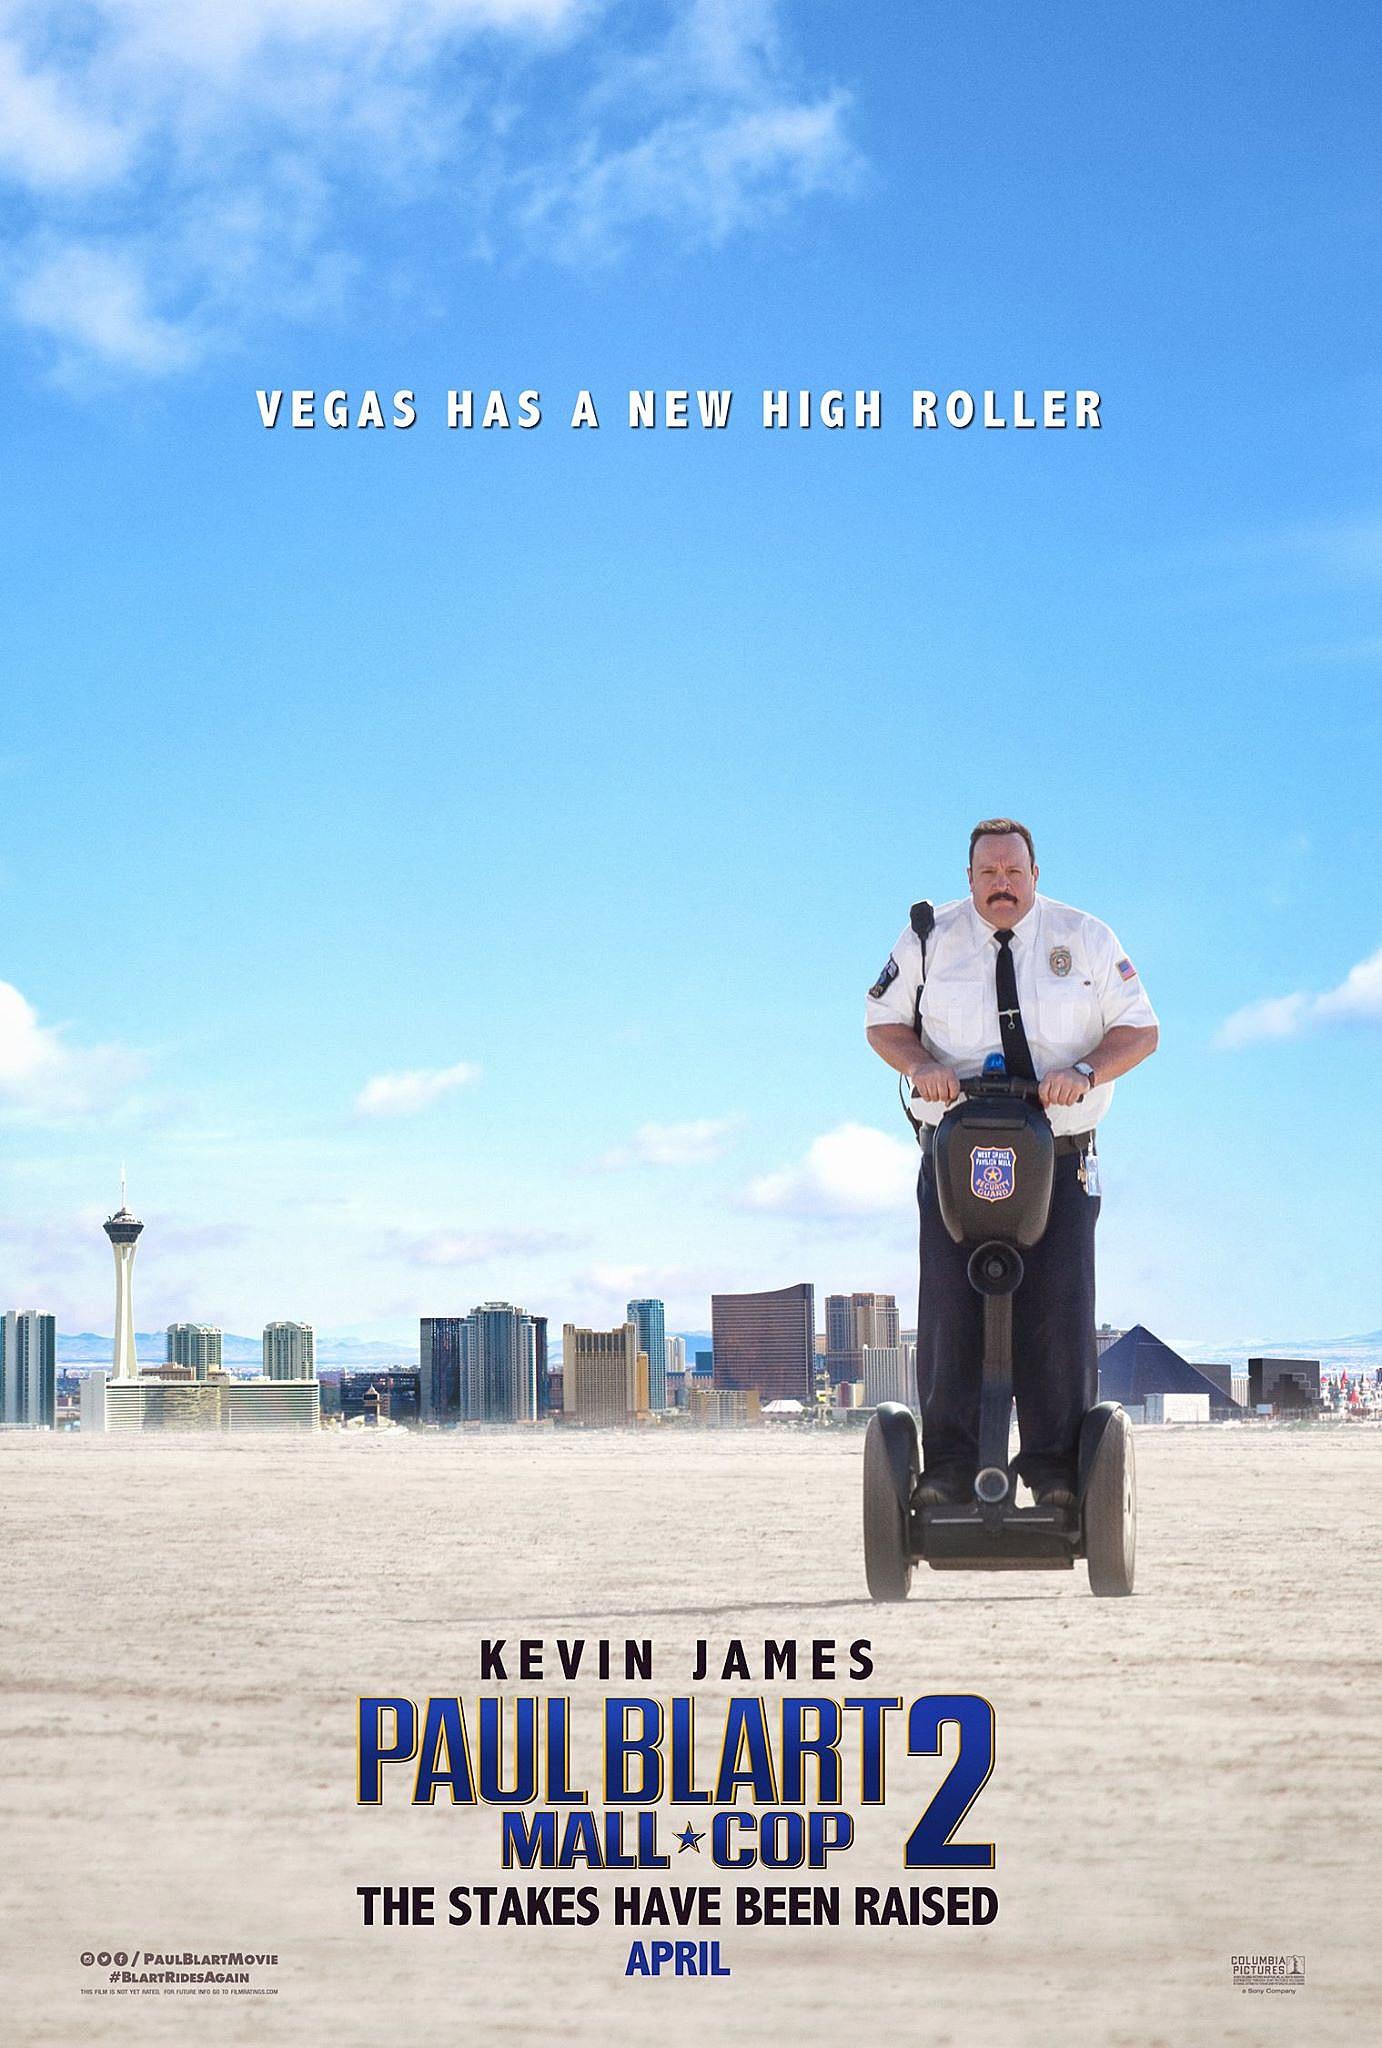 Paul Blart: Mall Cop 2' Trailer: Get Ready to Blart Harder